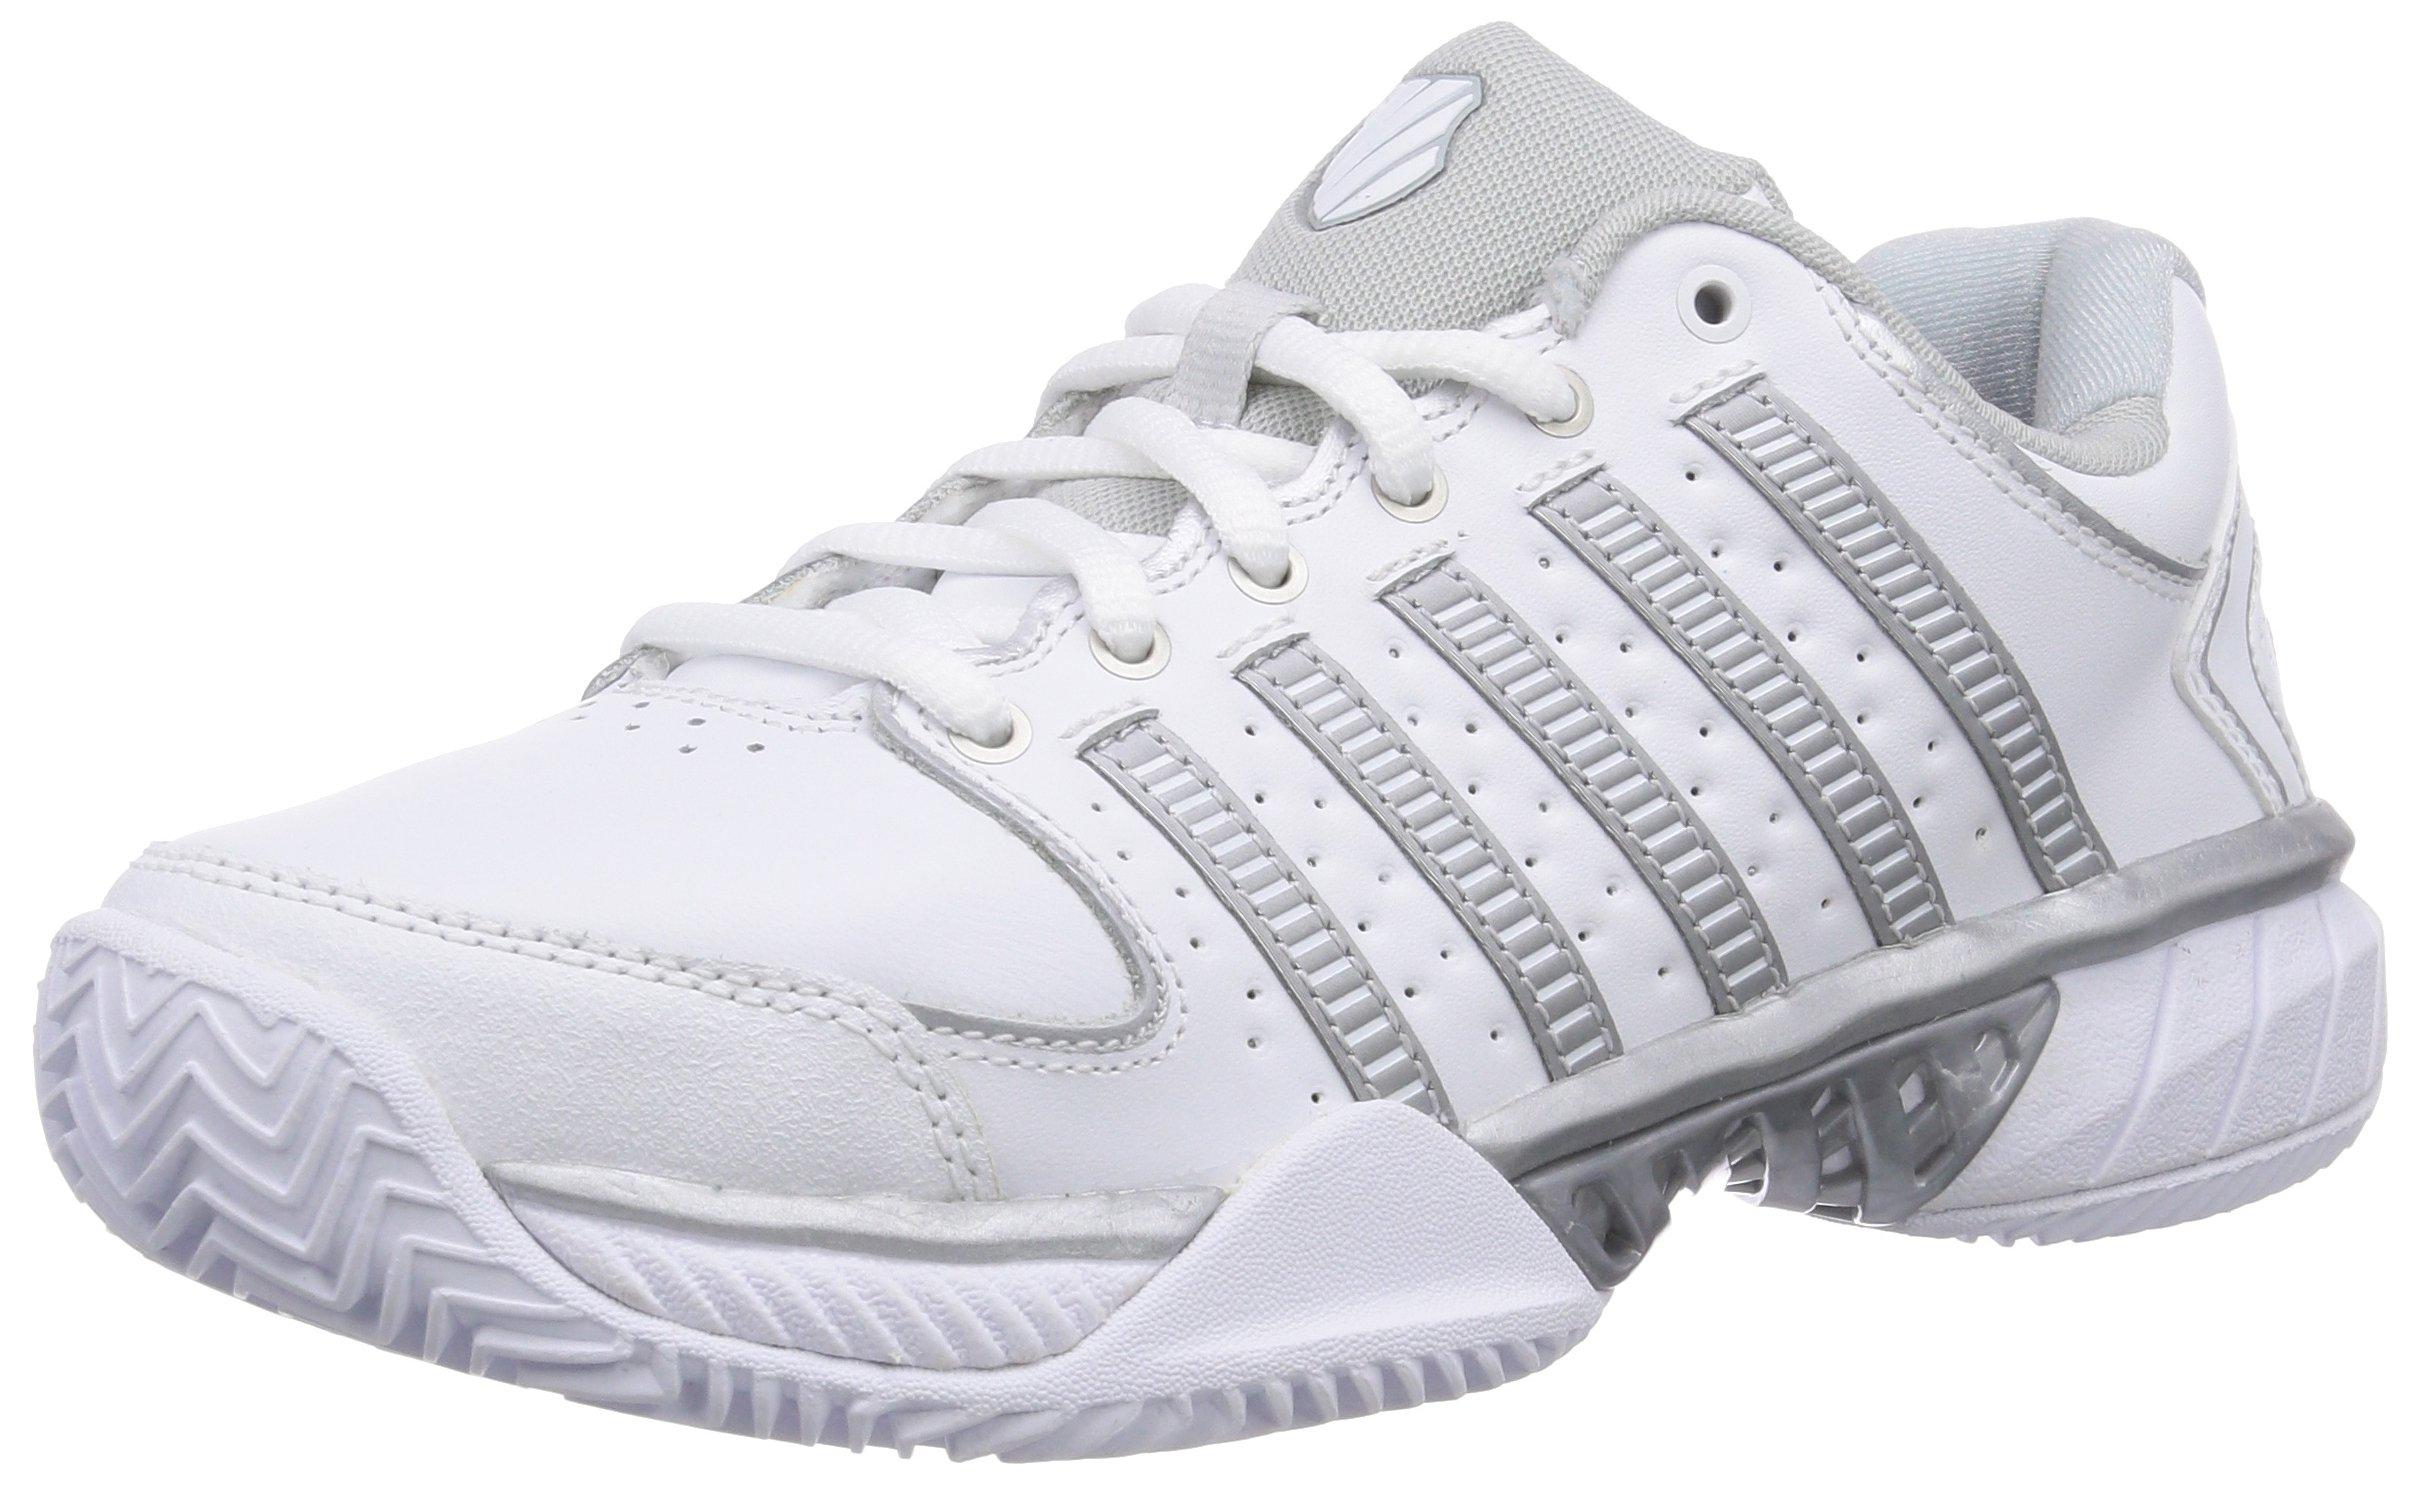 K-Swiss Hypercourt Express Leather Ladies Tennis Shoe, White, US6